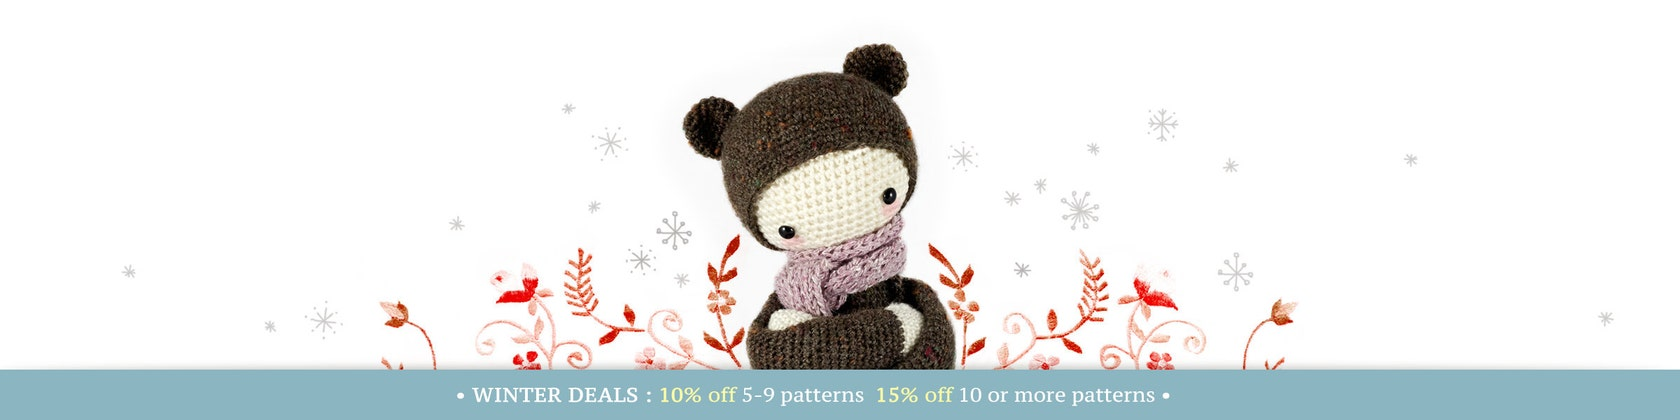 Amigurumi Crochet Patterns Van Lalylala Op Etsy